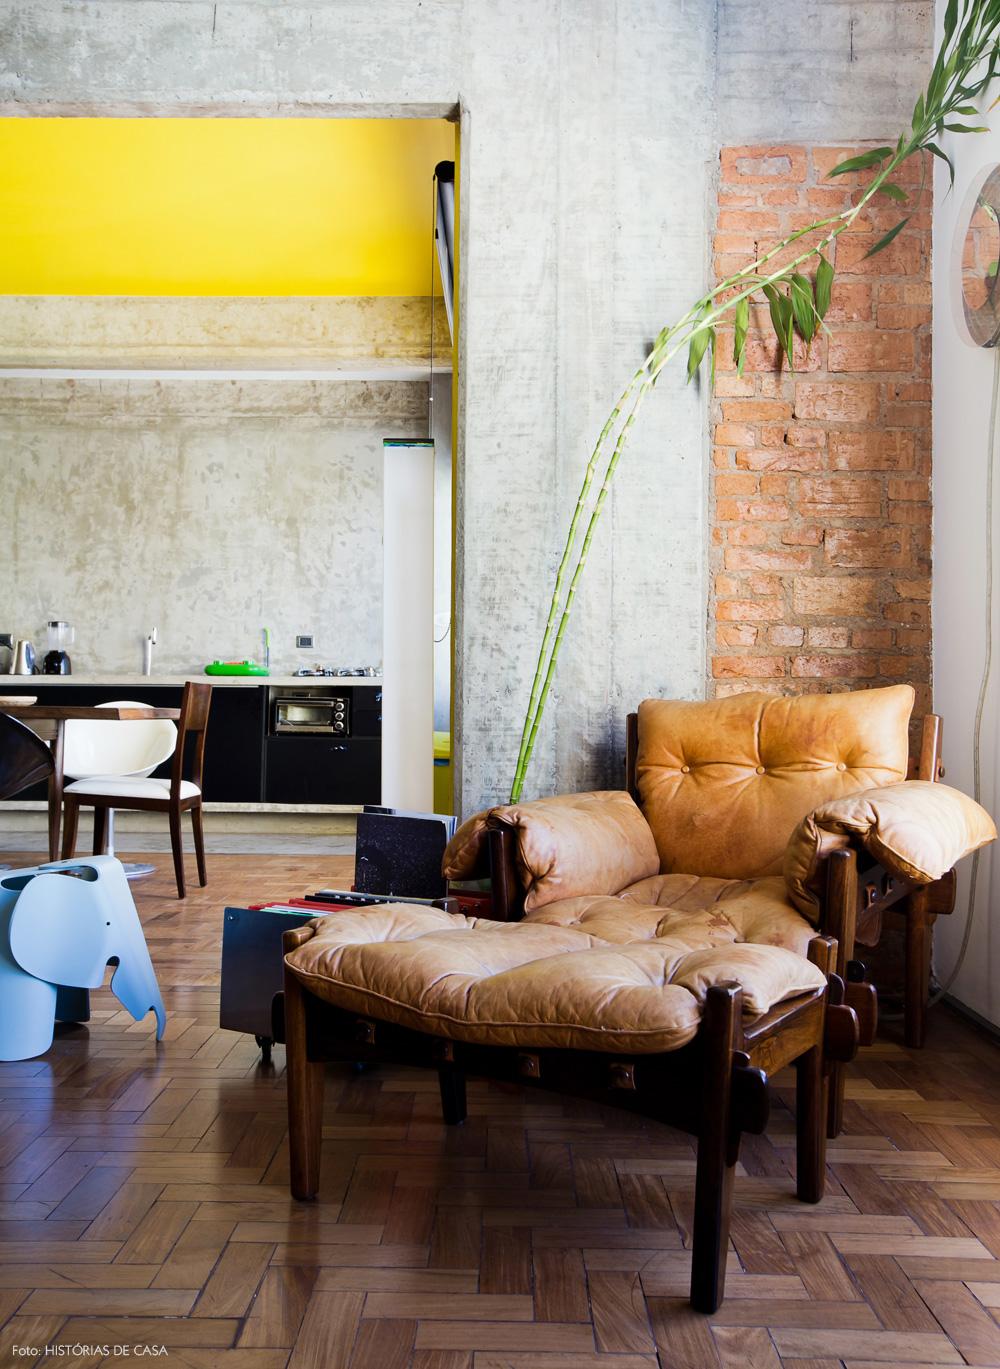 10-decoracao-concreto-tijolinho-poltrona-Mole-design